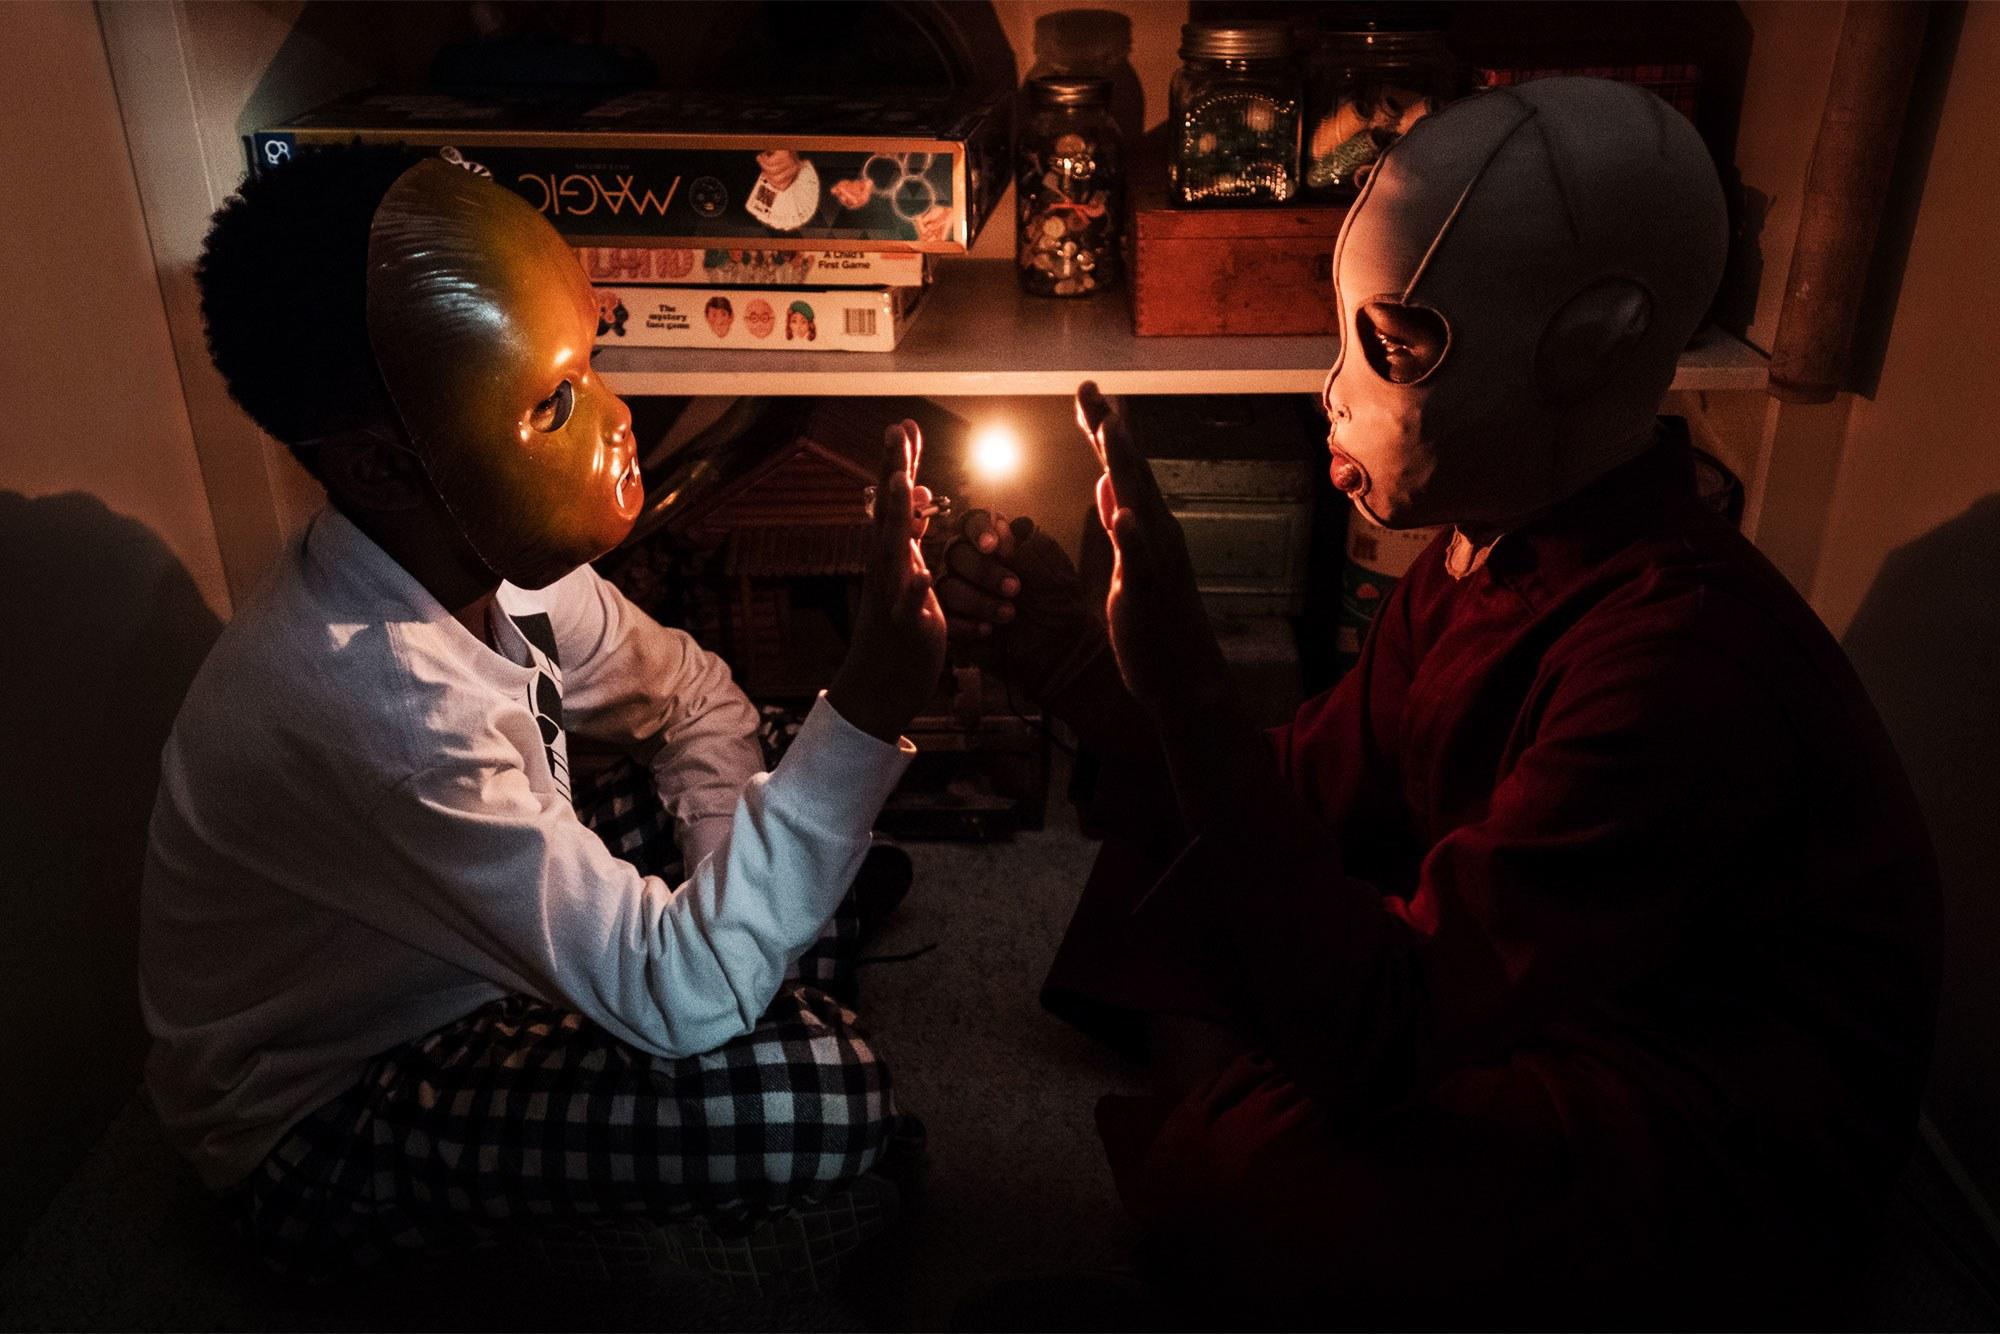 Joradan Peele's 'Us' Broke A Box Office Record With $40M-$48M Debut